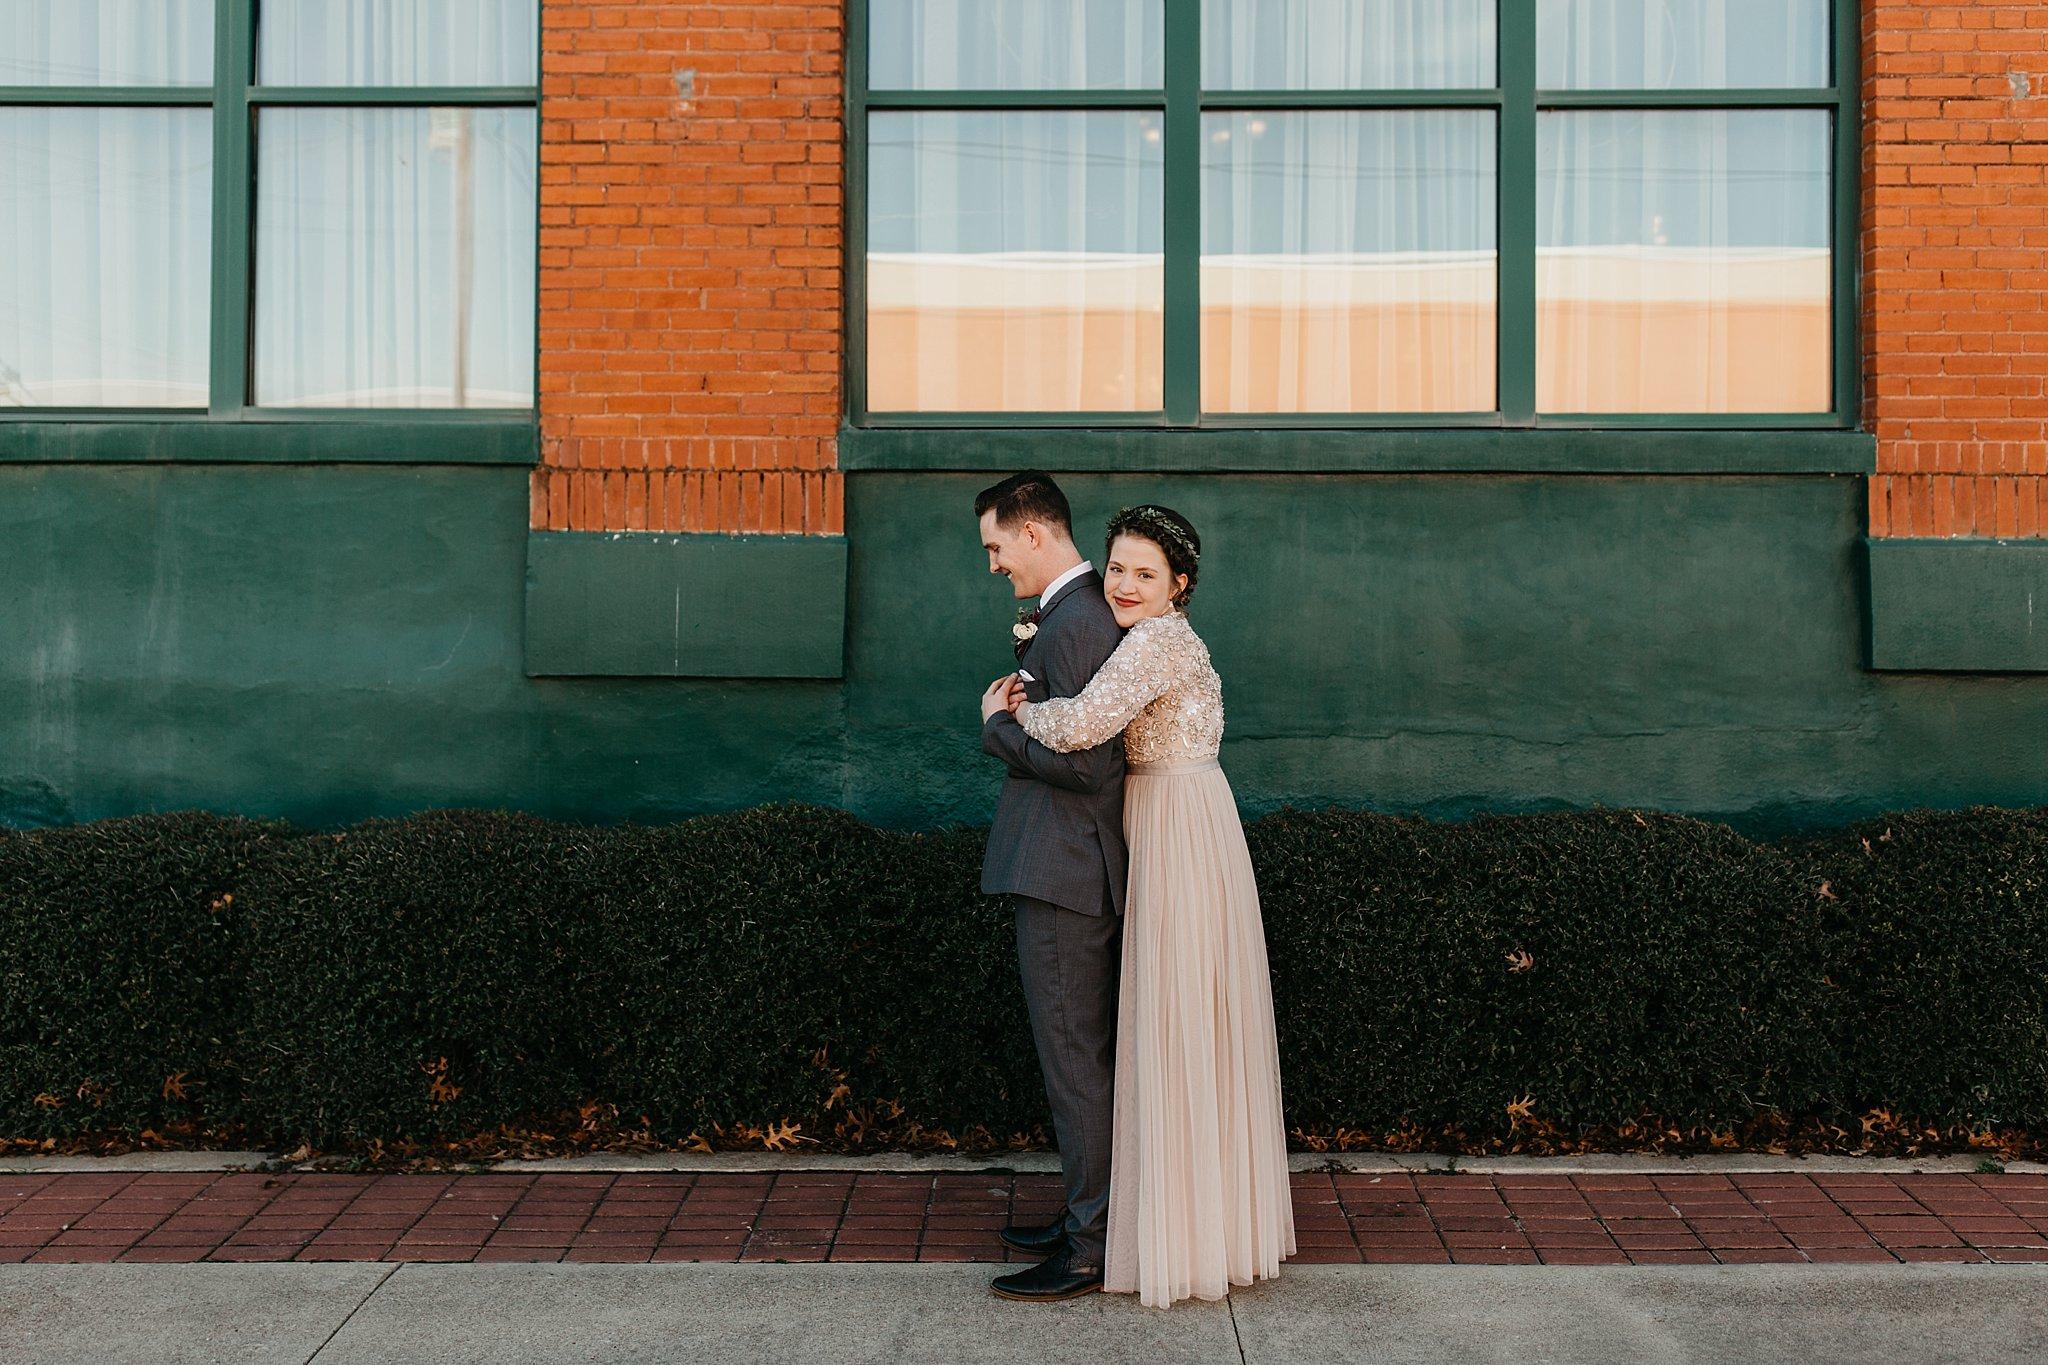 Wilderlove Co_Waco Texas_The Phoenix_Romantic Wedding Photography_0021.jpg